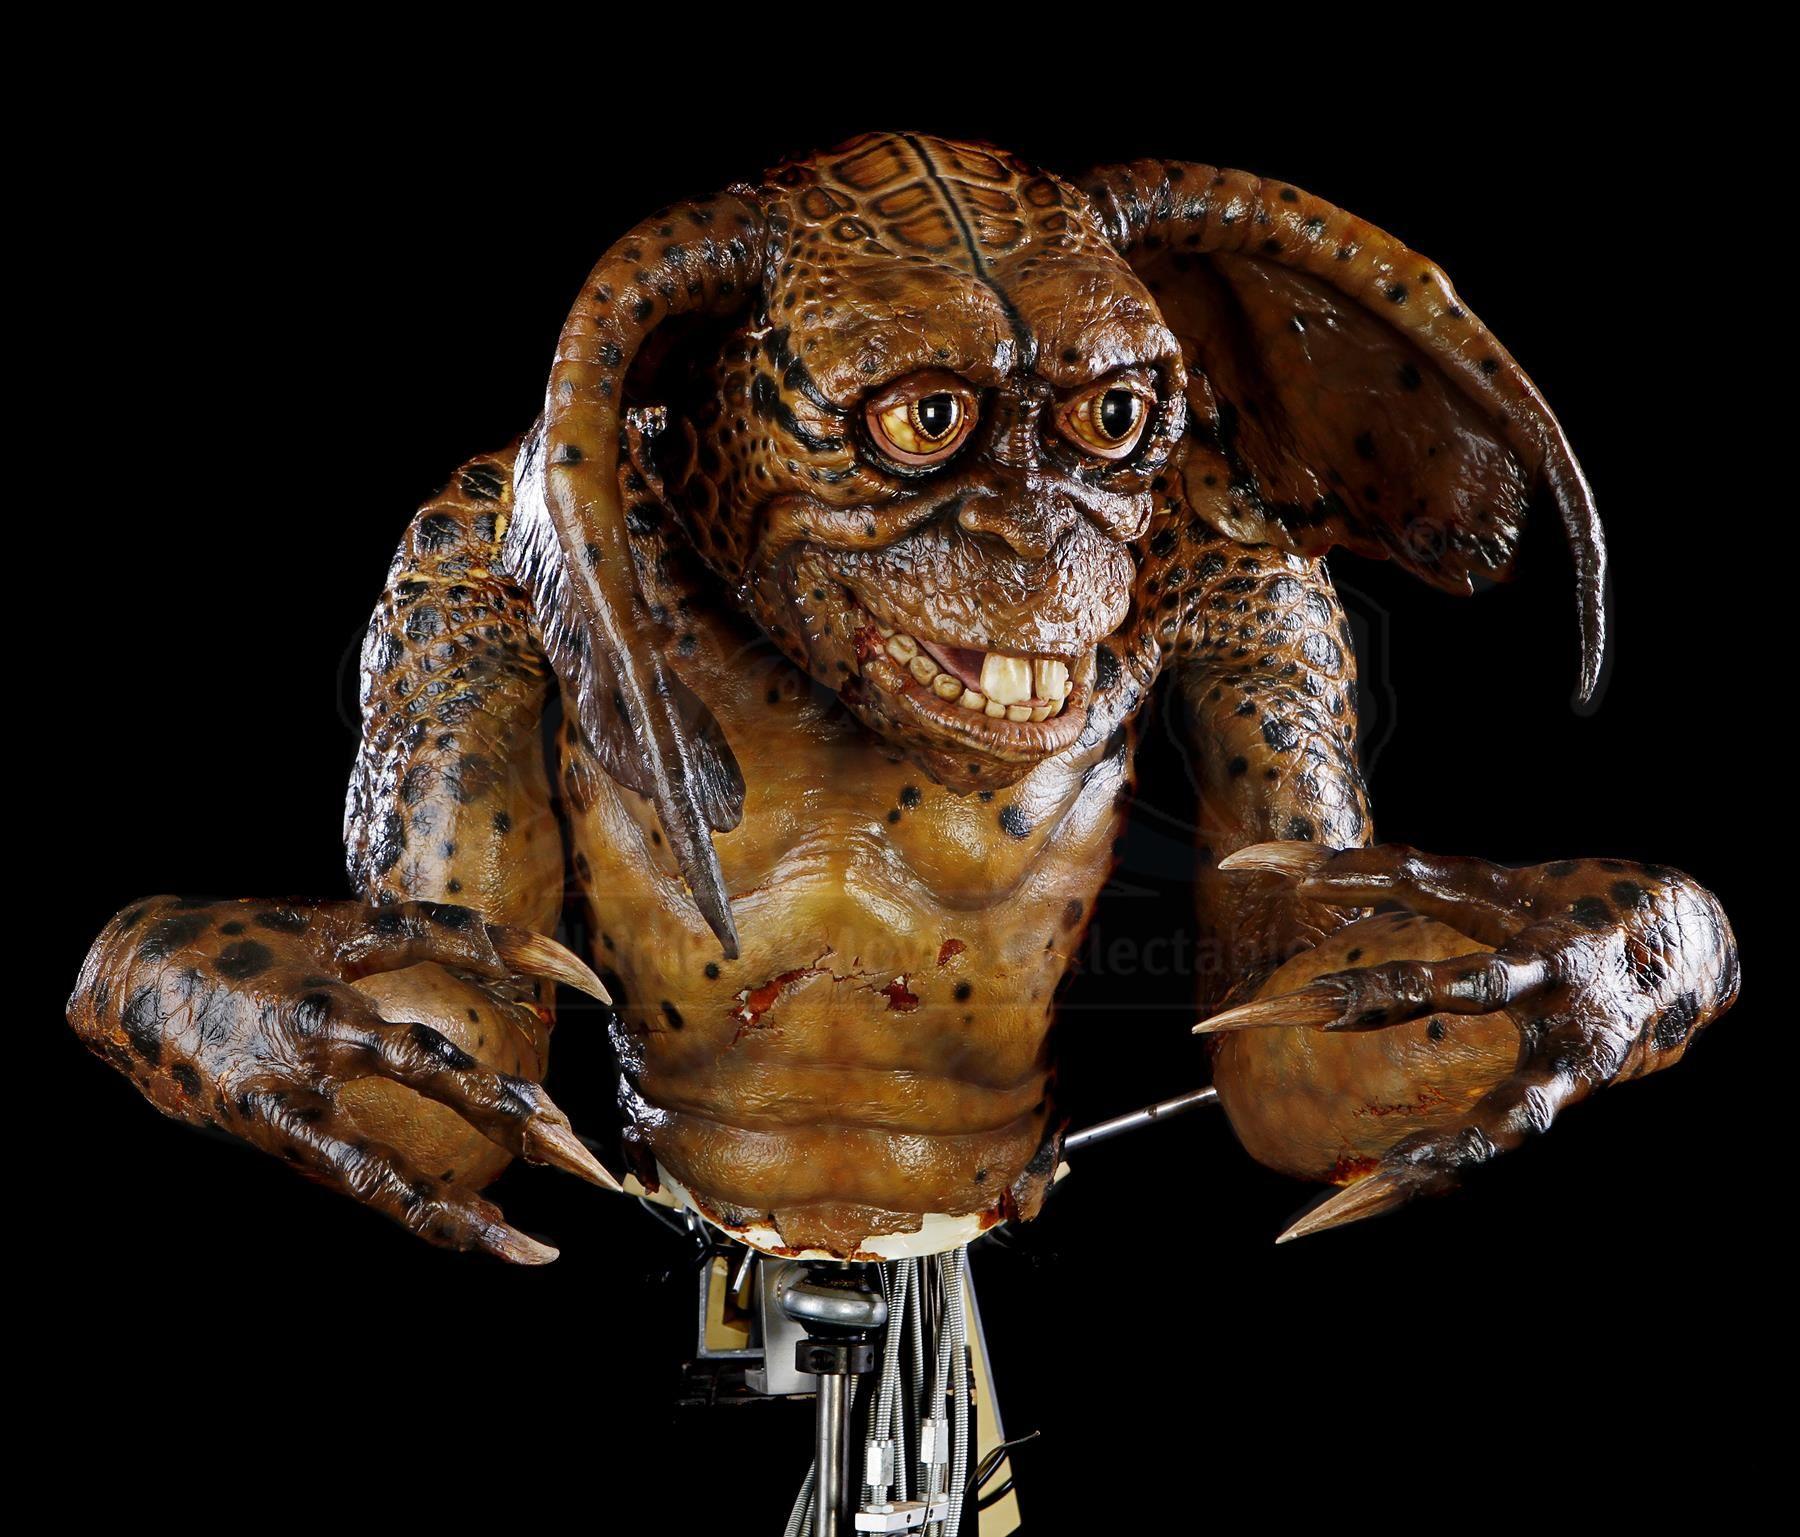 GREMLINS 2: THE NEW BATCH (1990) - Mechanical Lenny Gremlin Puppet - Price Estimate: $4000 - $6000